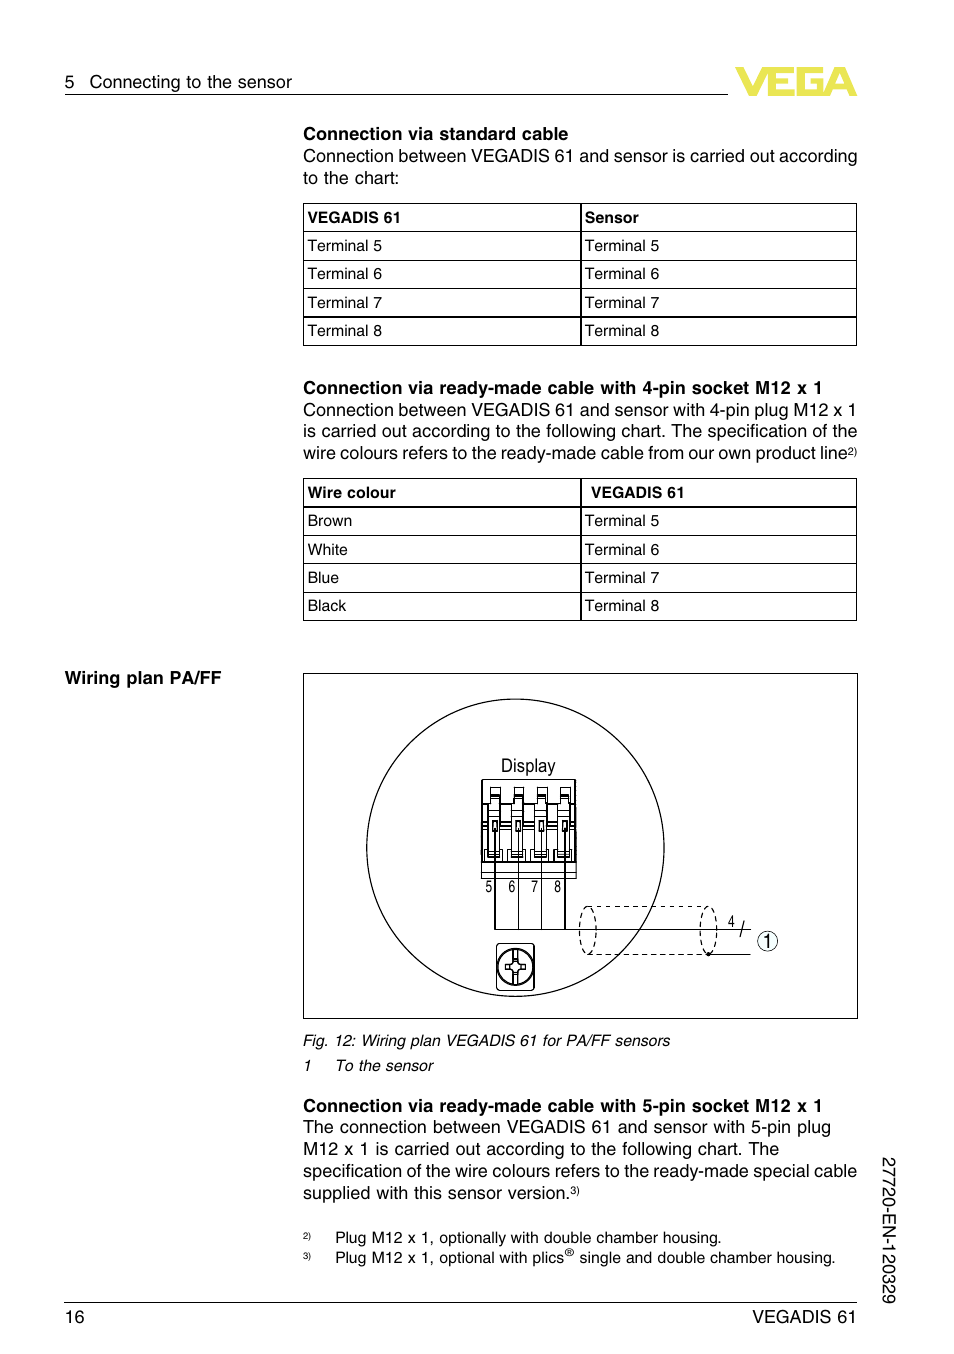 5 Pin M12 Wiring Wire Center Diagram Vega Vegadis 61 User Manual Page 16 28 Rh Manualsdir Com 12 Harness